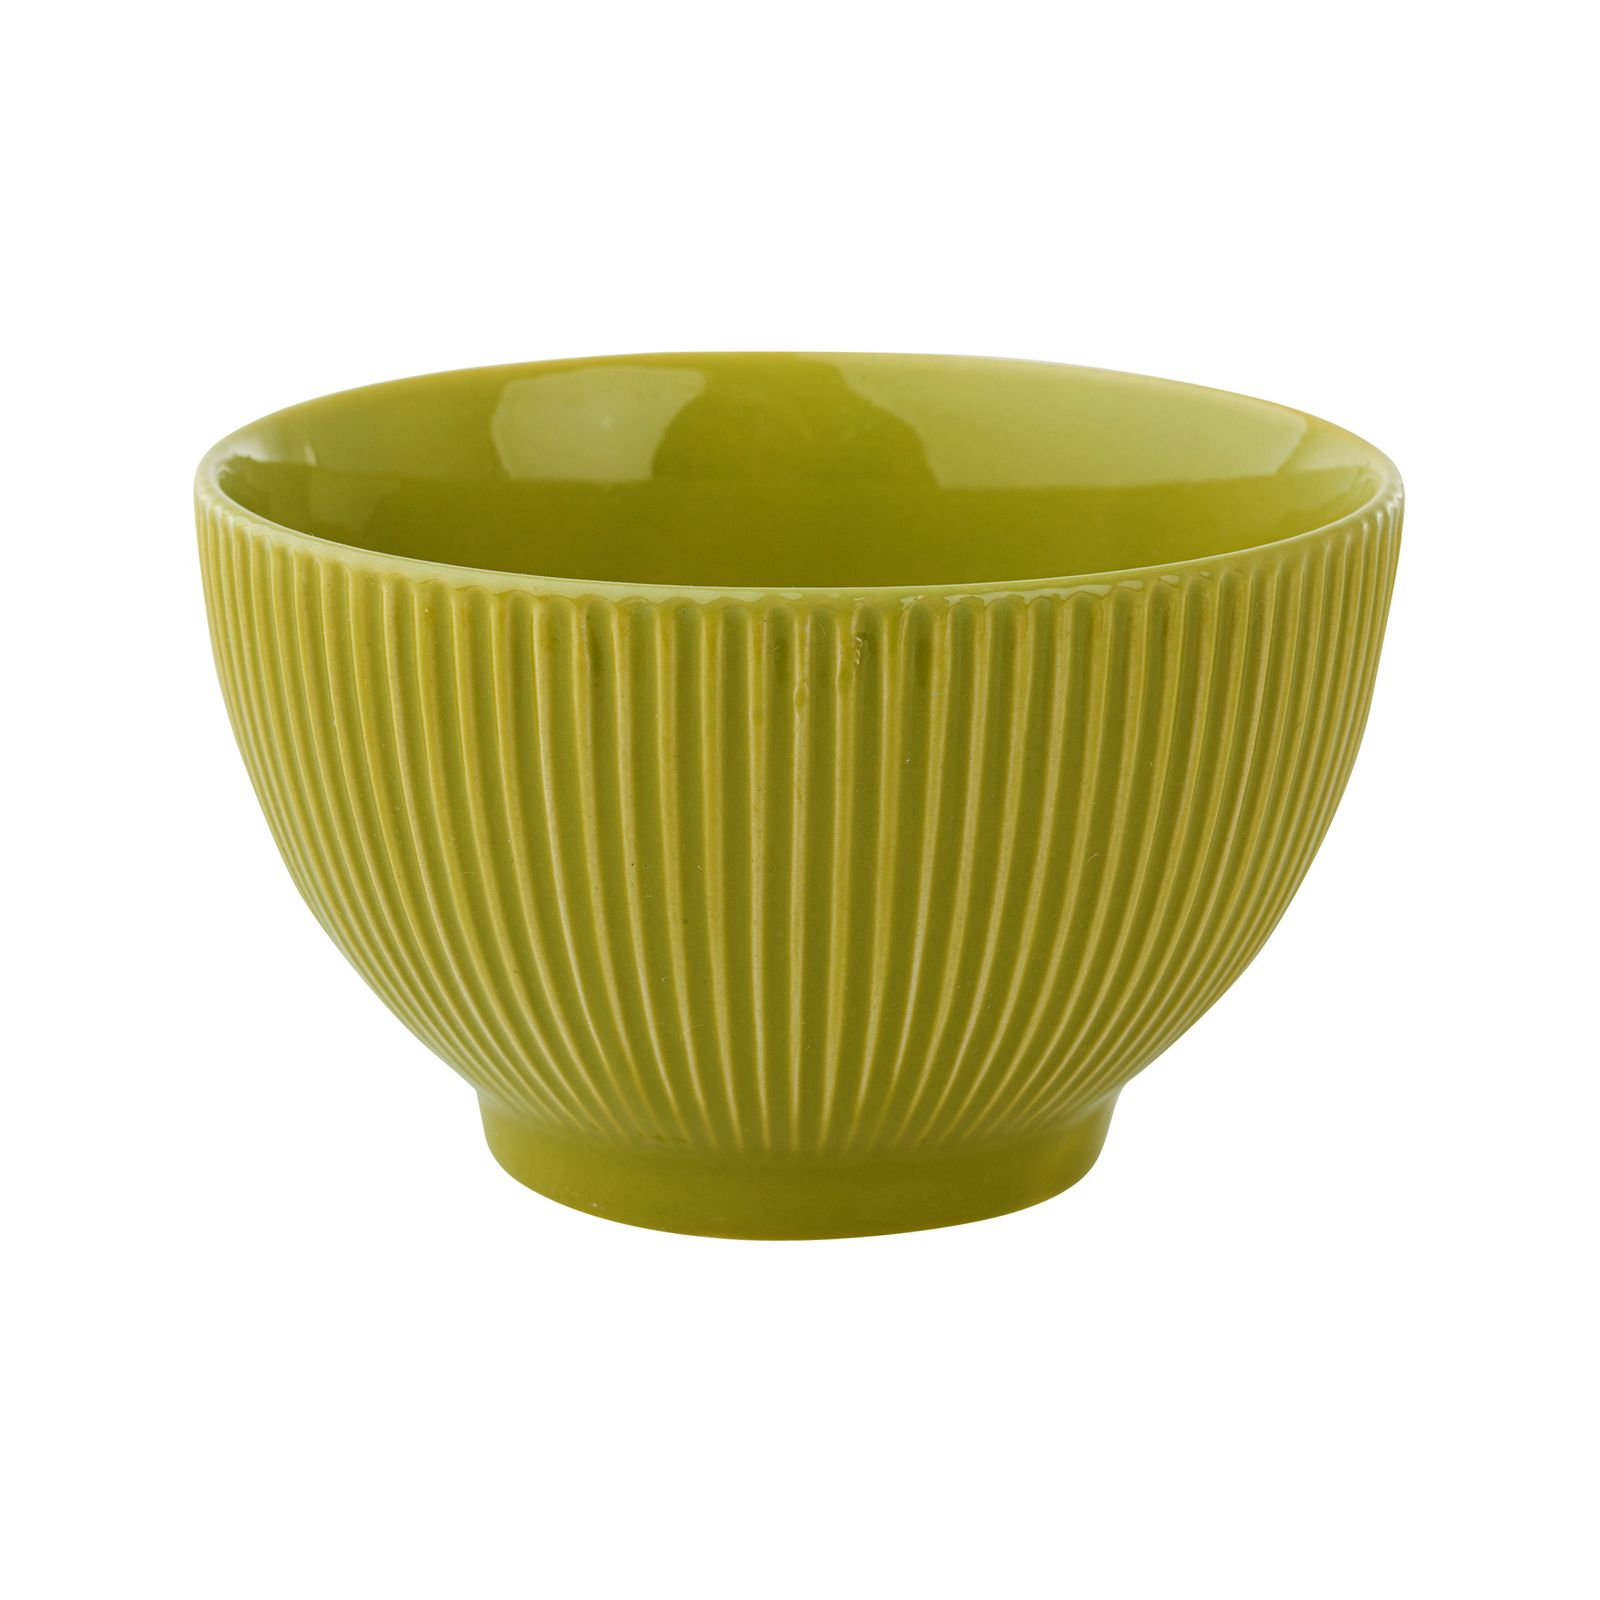 Salad bowl Palette 14.5 cm AMBITION Lime green